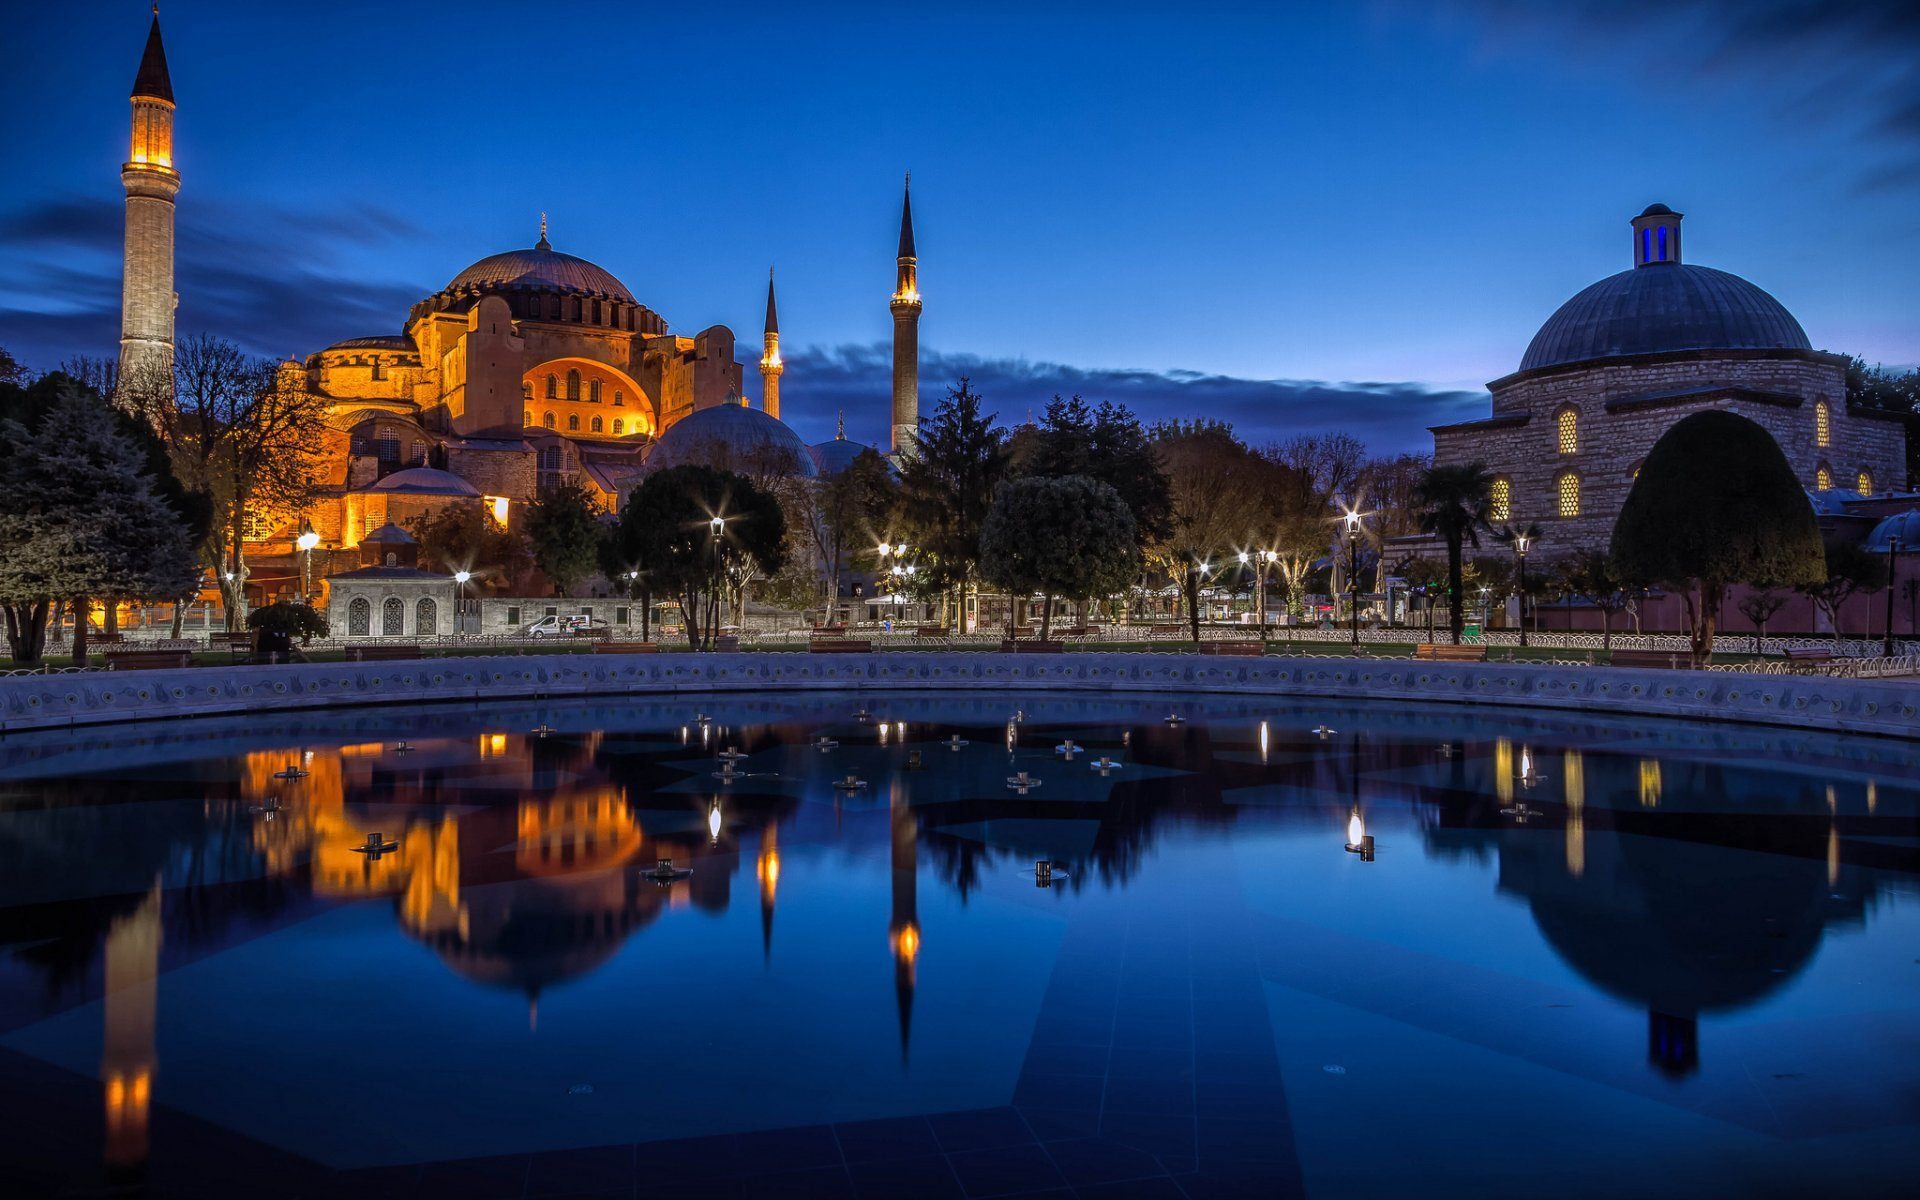 Aya Sophia Turkey Wallpaper HD For Desktop in High Quality